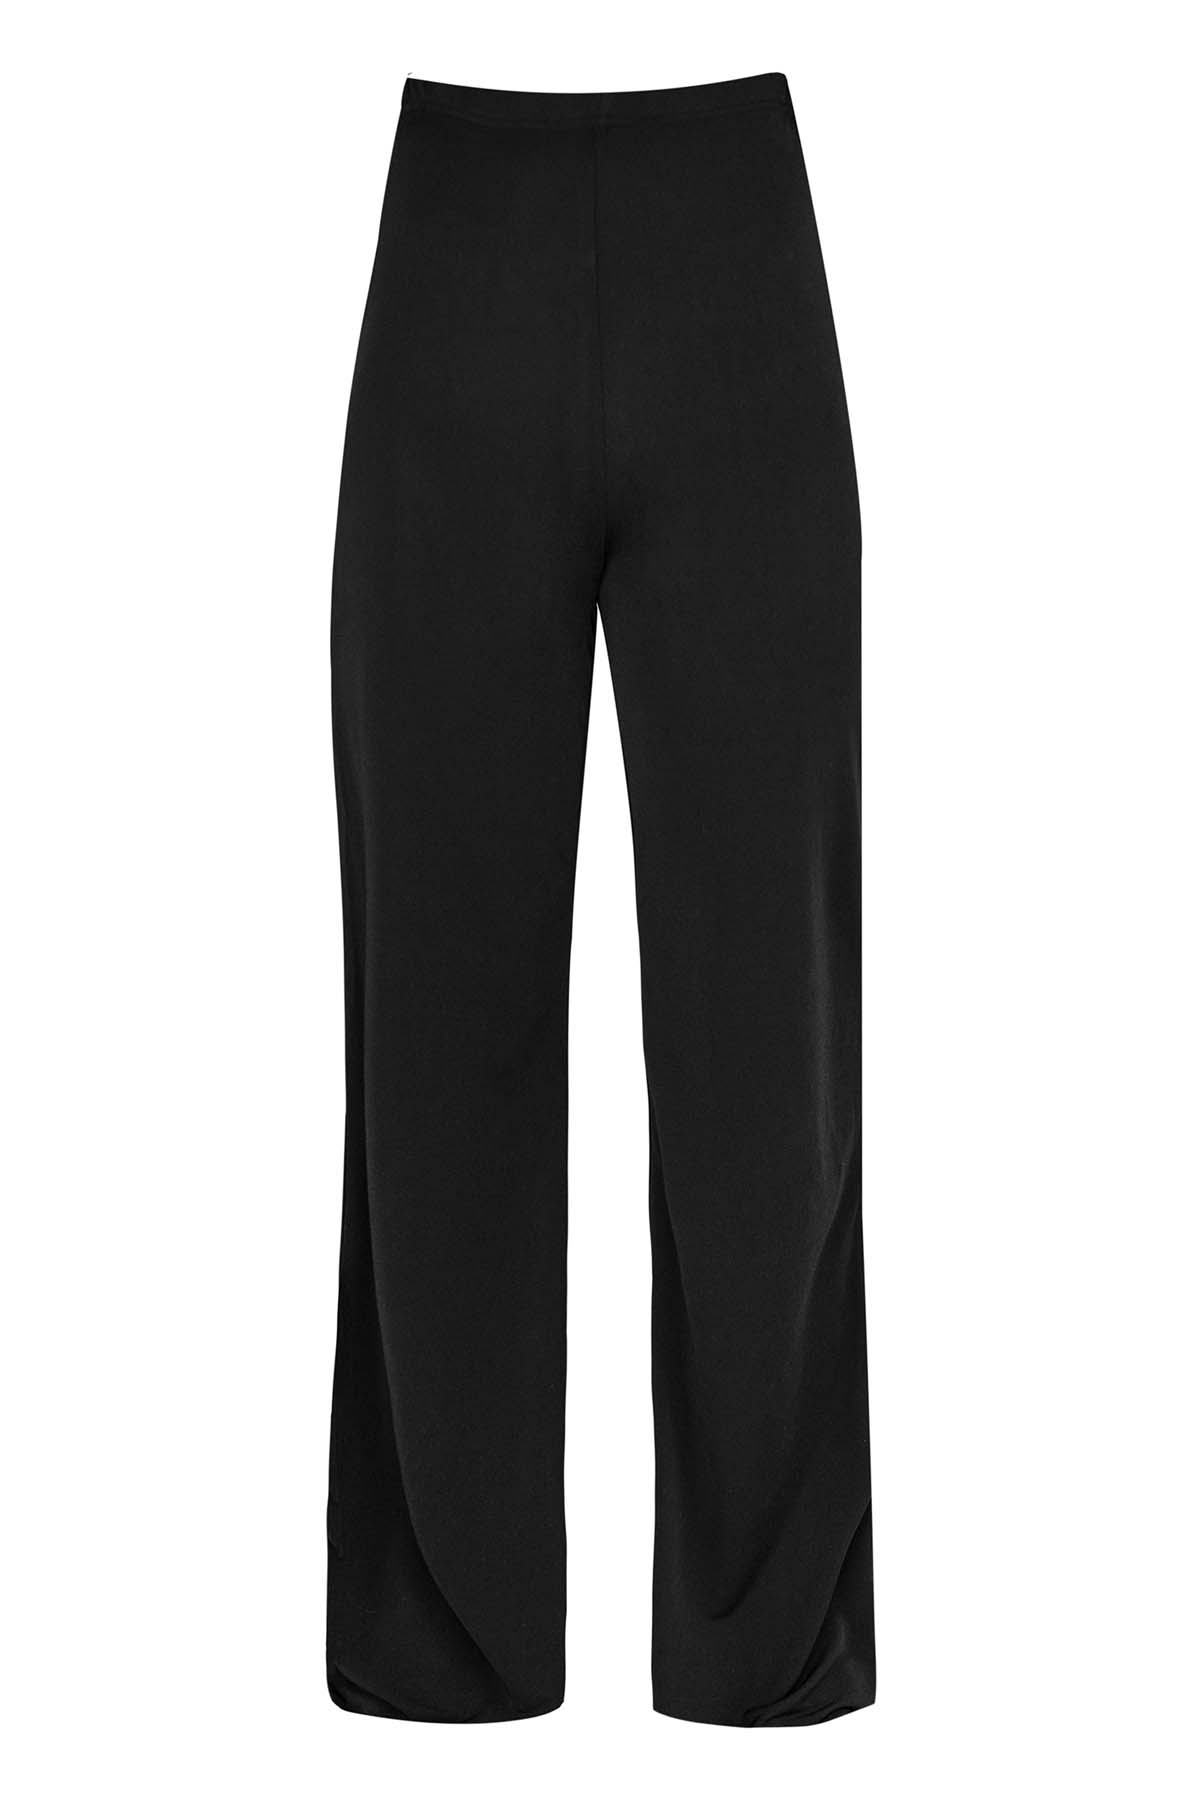 Teria Yabar - Pantalón flare negro